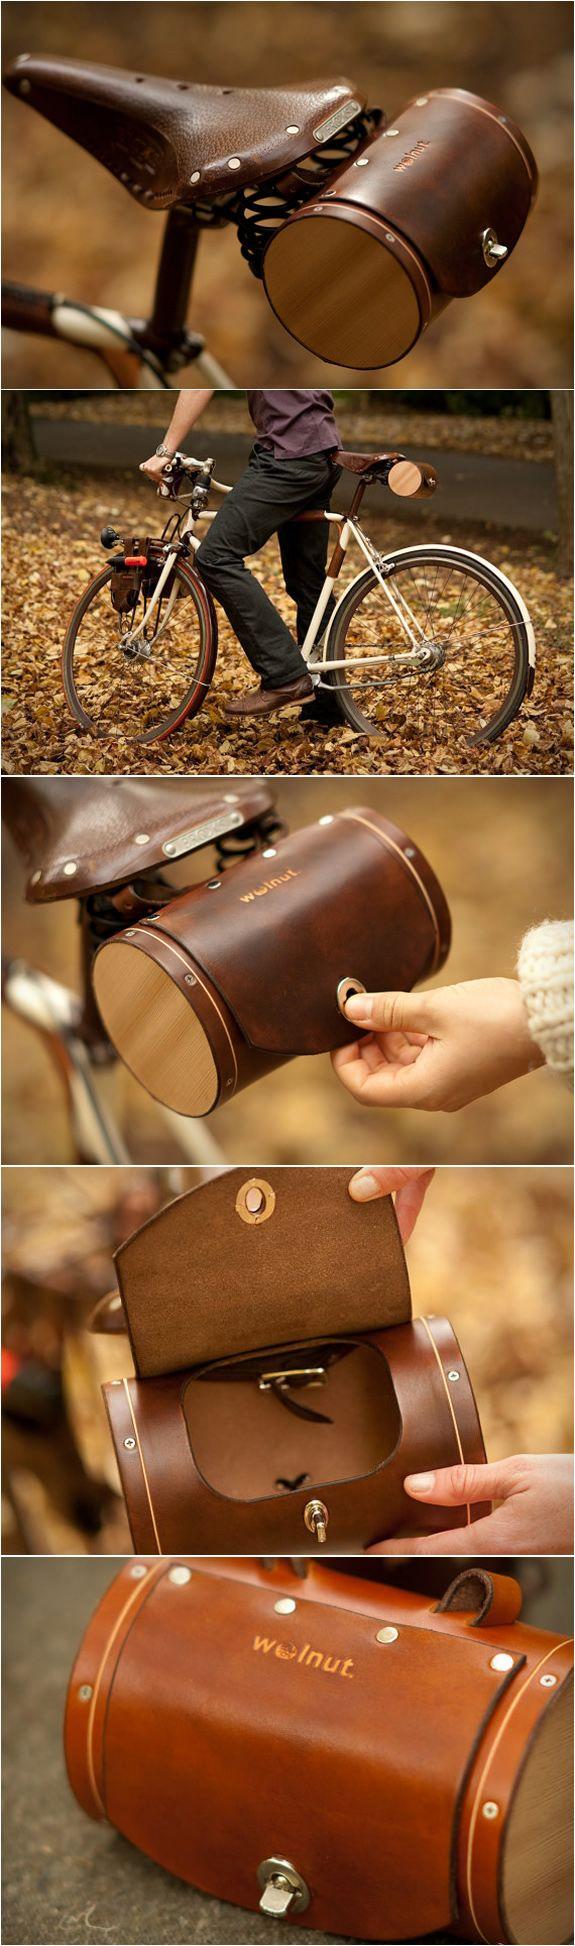 Bicycle Saddle Bag / Barrel Bag // cycling // bikes - fashion & style. Very cool!